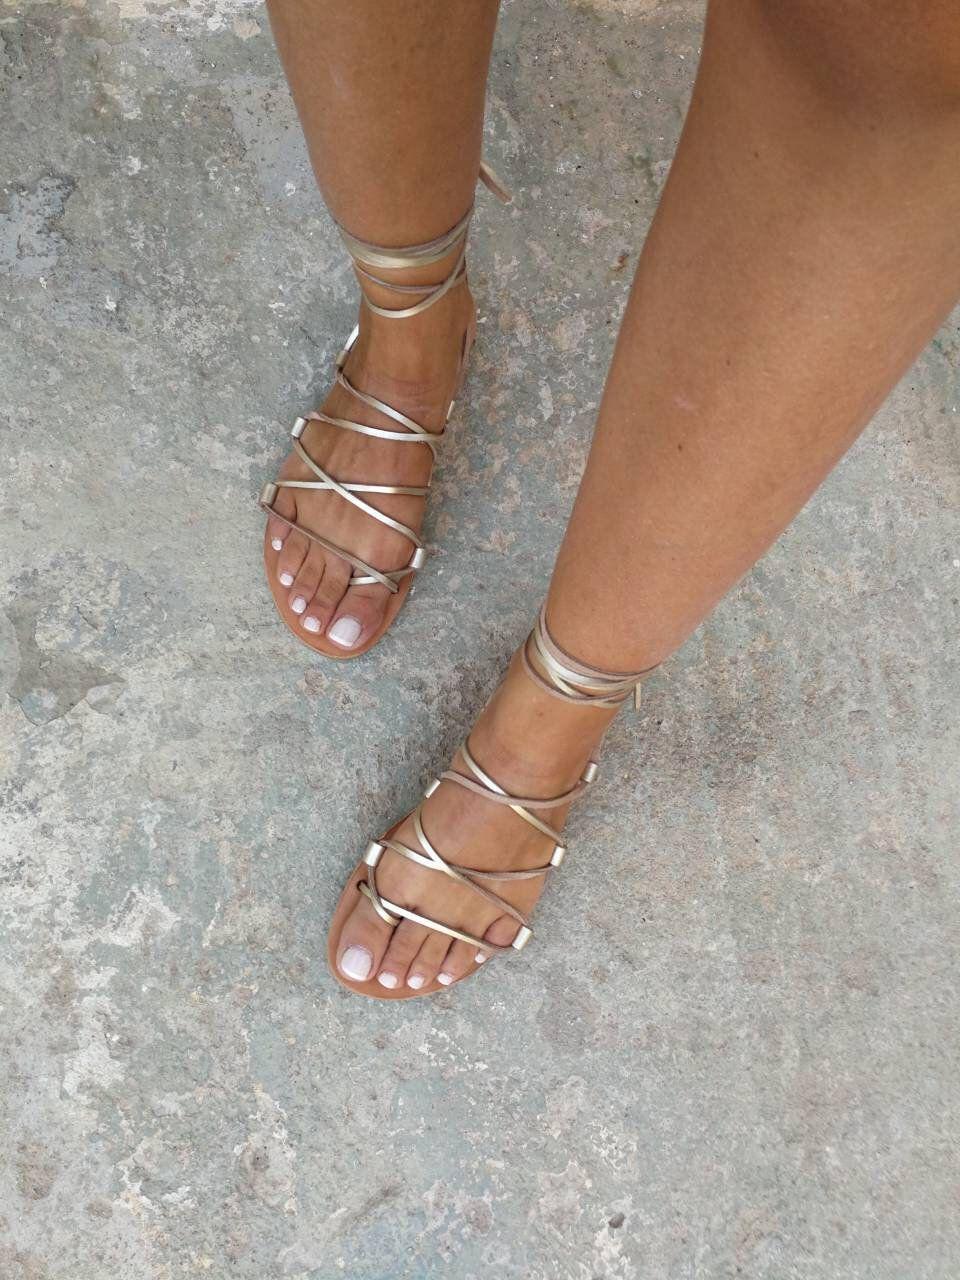 Tie up Greek sandals, Gold Gladiator Sandals, Leather Sandals, Flat Sandals, Handmade, Women sandals, Lace up, Summer Sandals, Real Leather